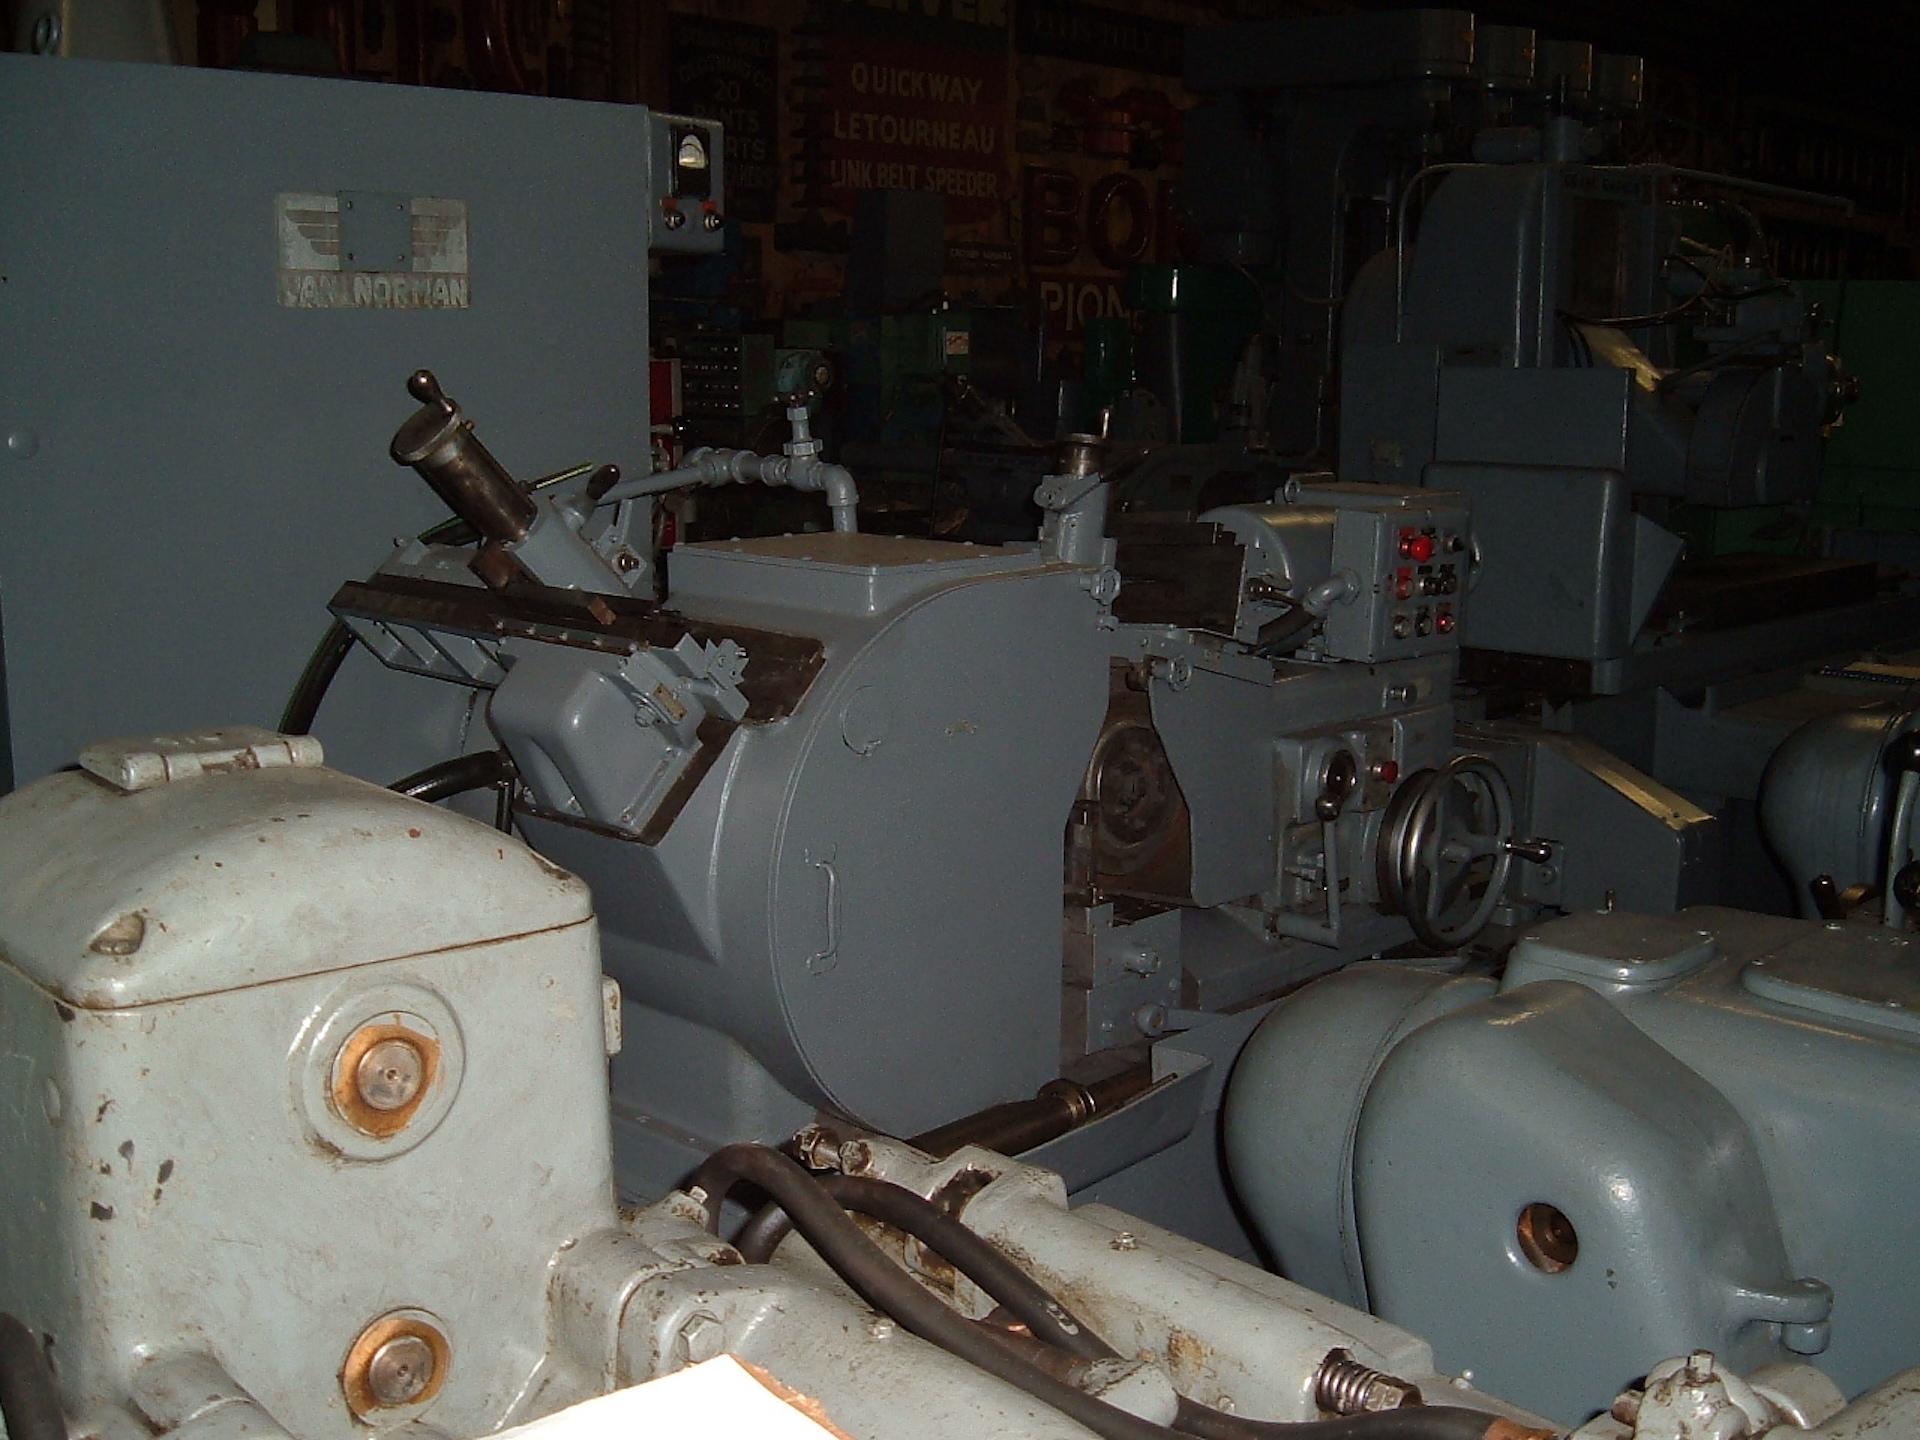 VAN NORMAN 2C CENTERLESS GRINDER: MFG-1962, 15Hp Main, Auto-Infeed, Hard-ways - Image 2 of 2